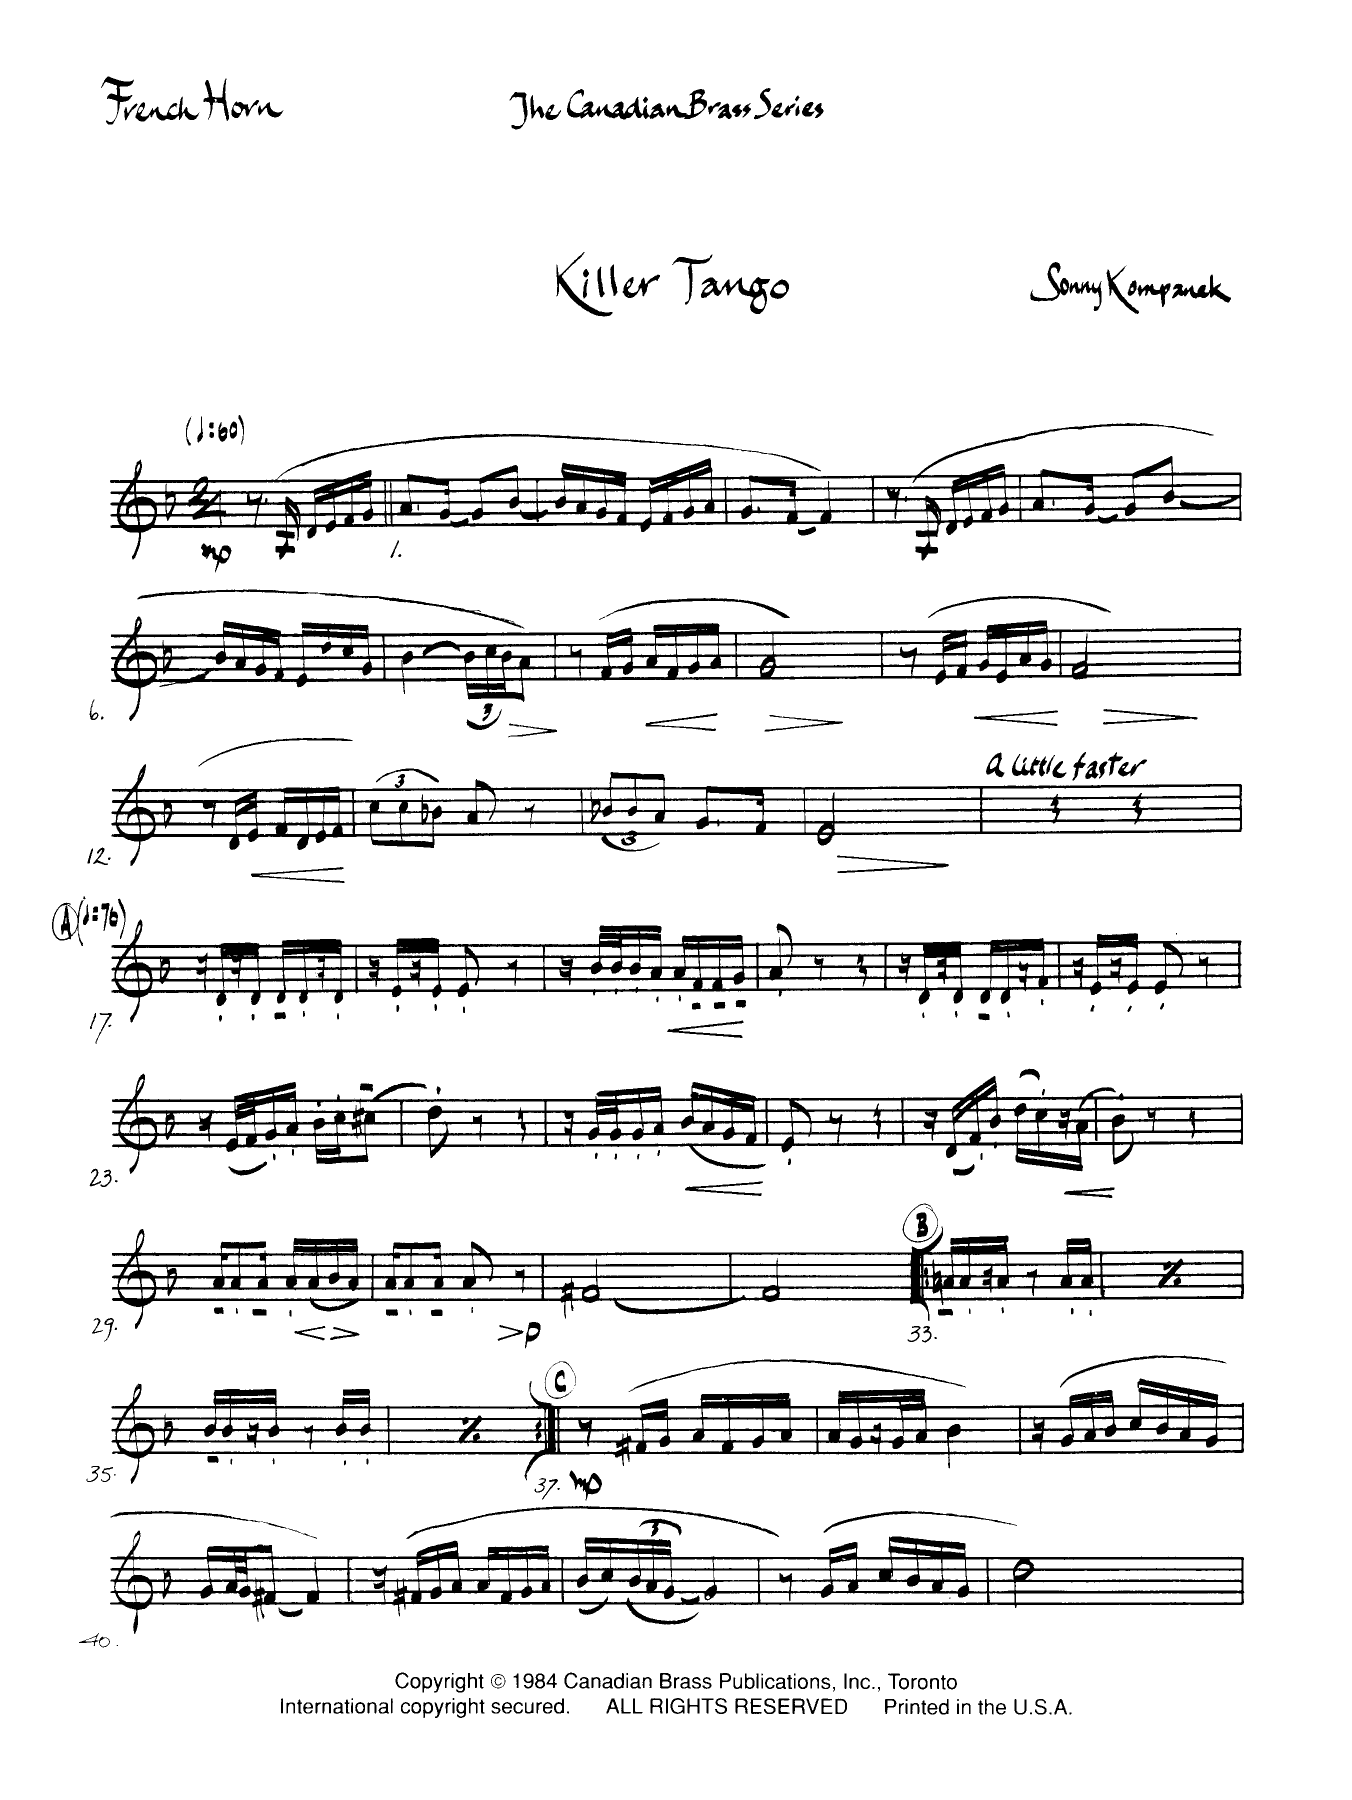 Killer Tango - Horn in F Sheet Music